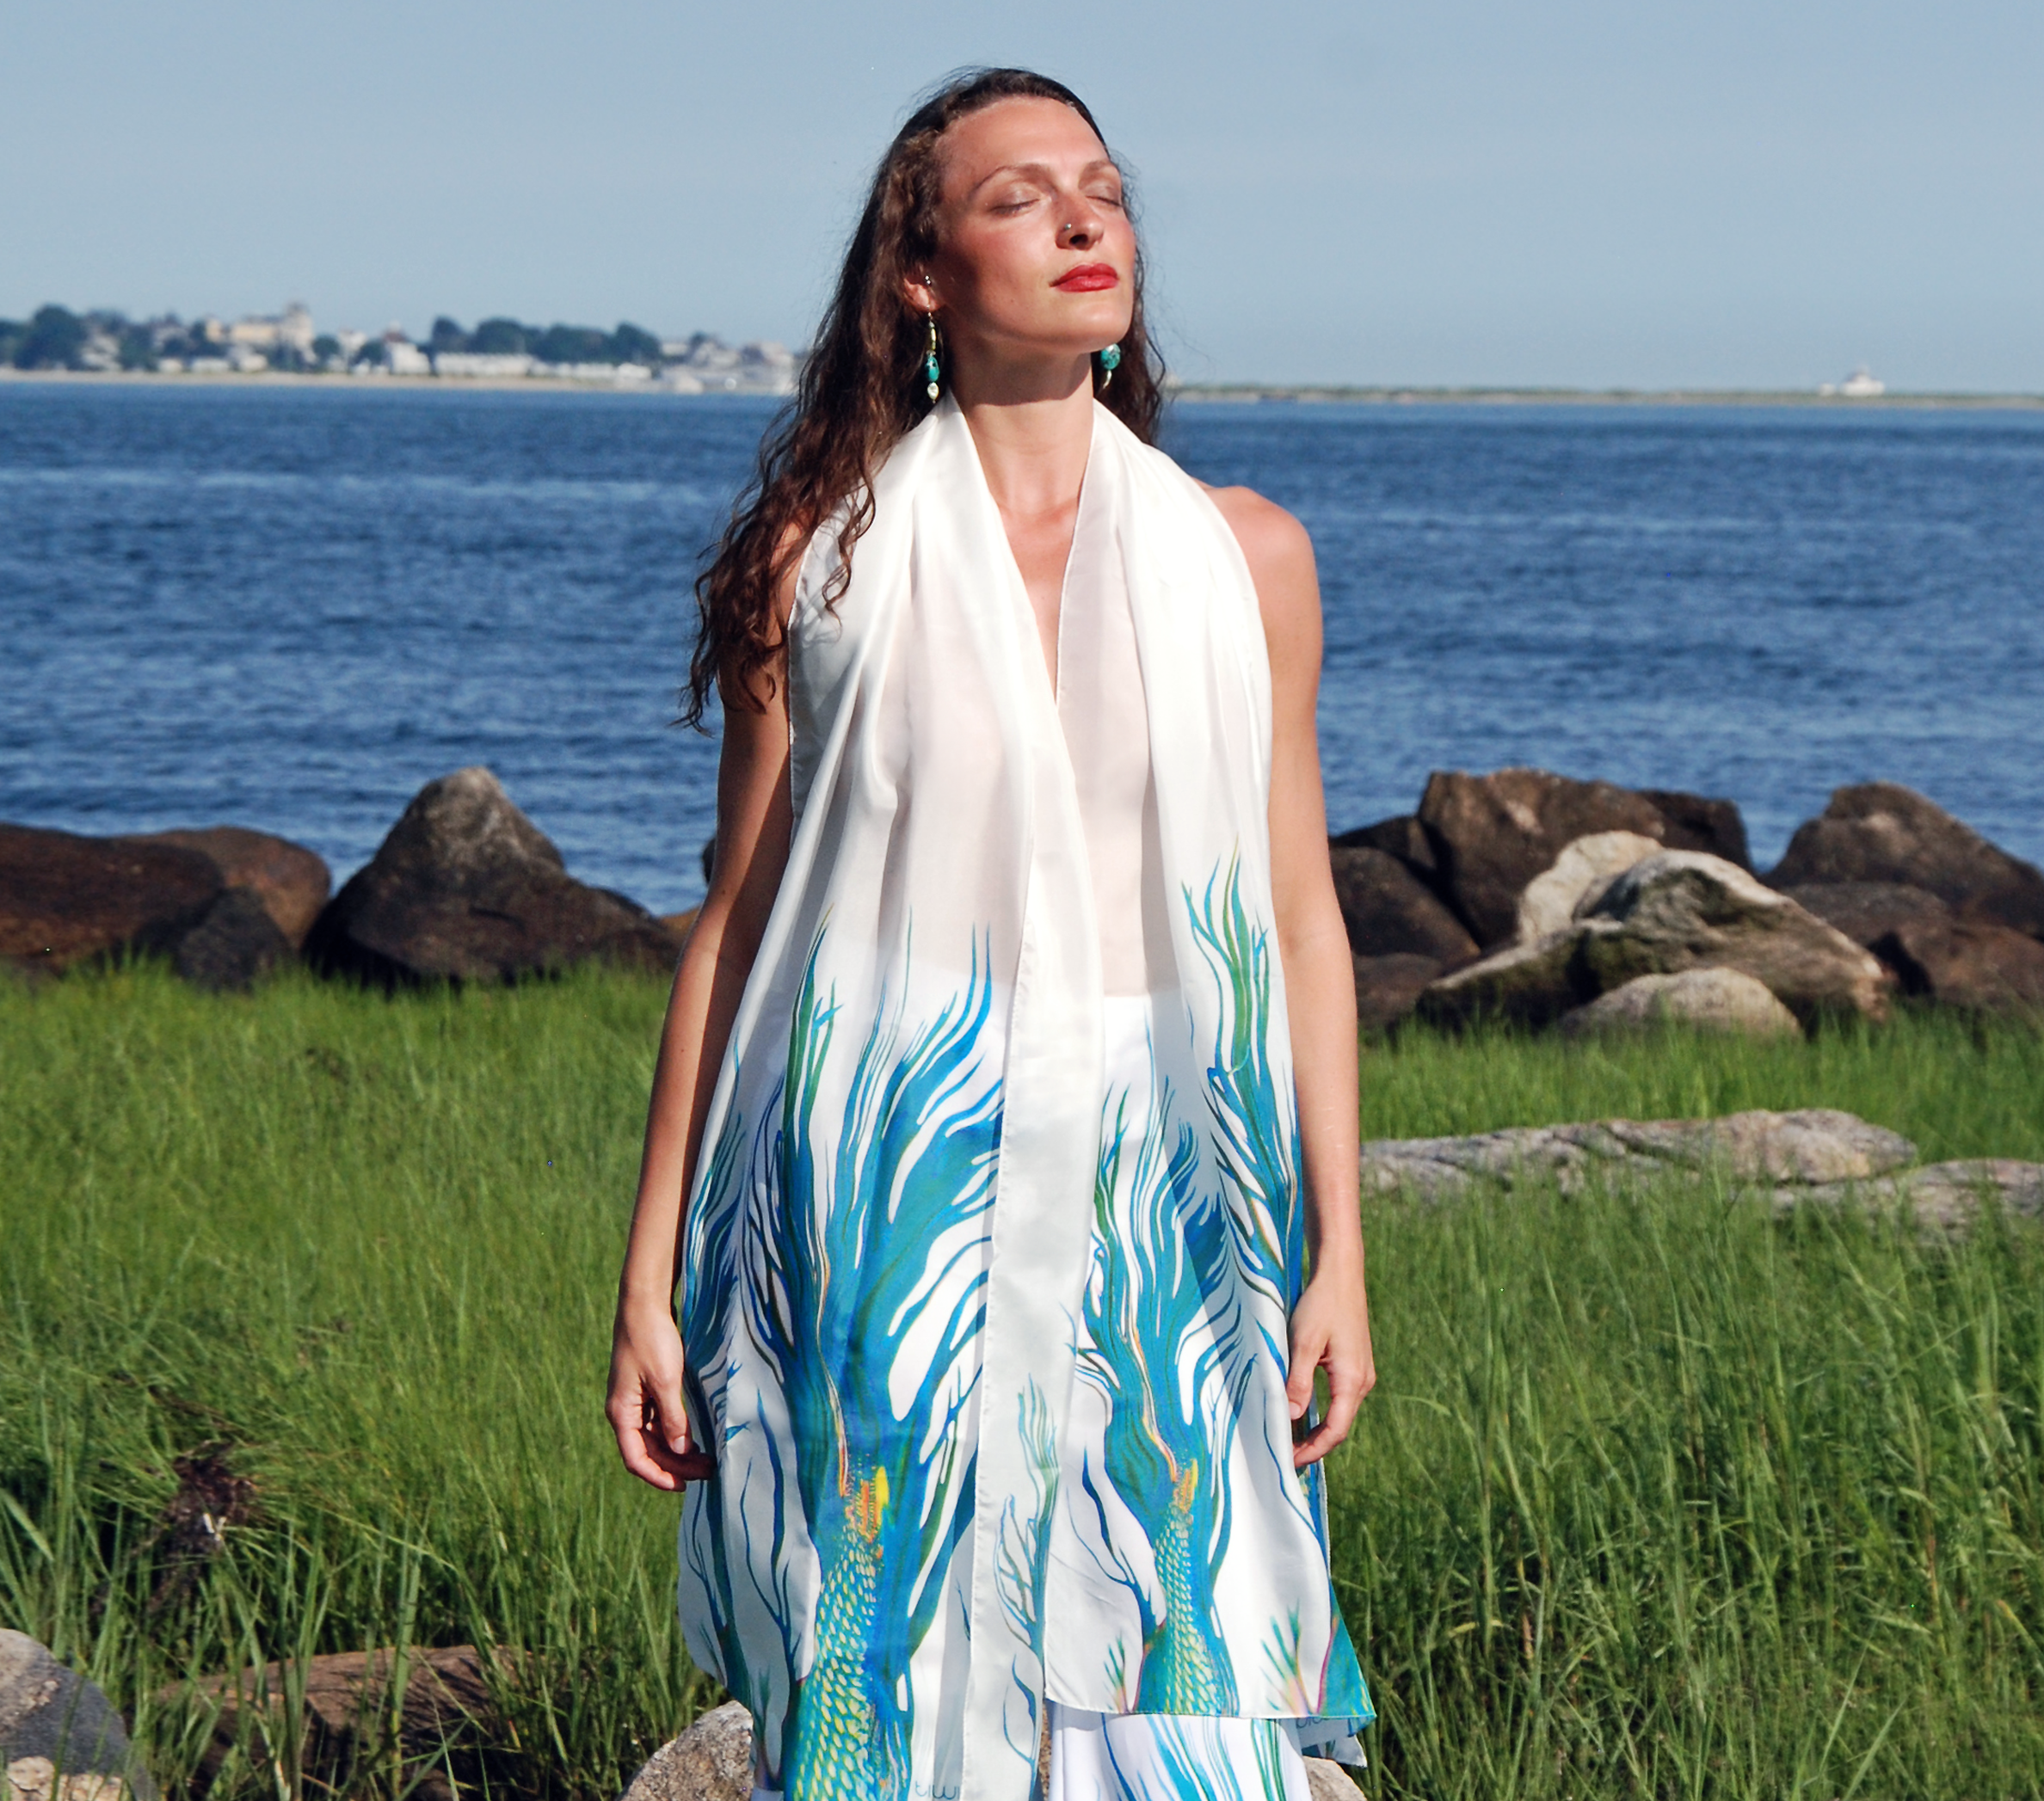 tiwia dive deep emily silk scarf fishtails 1.jpg